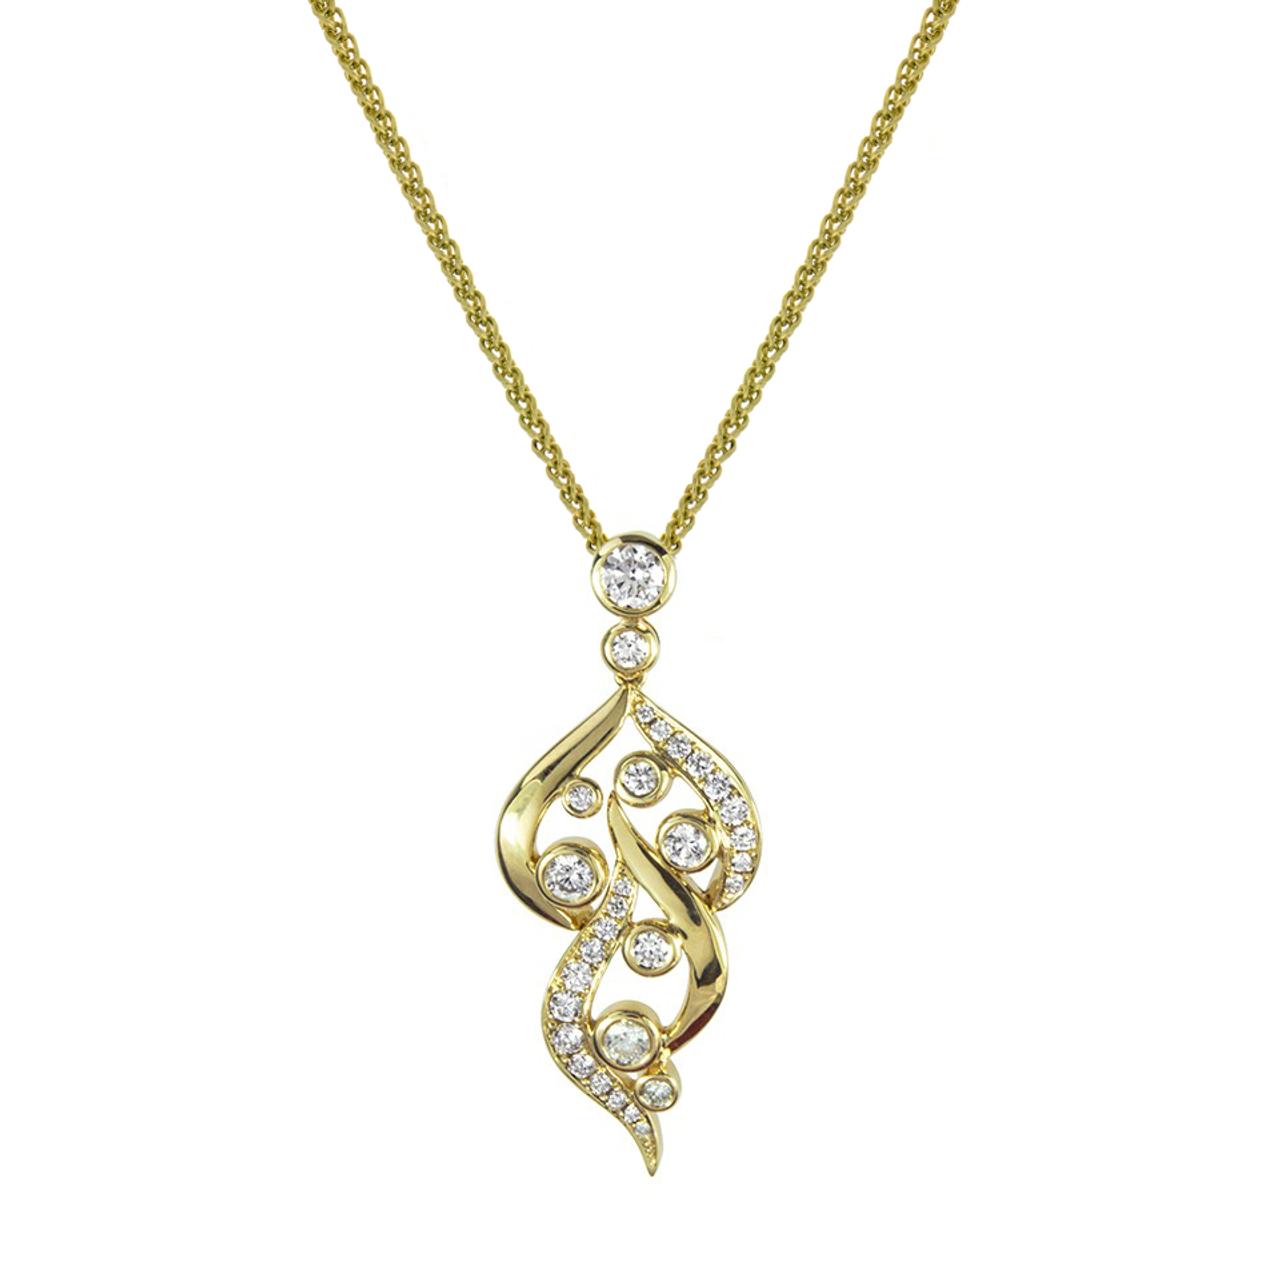 18ct Yellow Gold & Diamond Flame Pendant & Chain